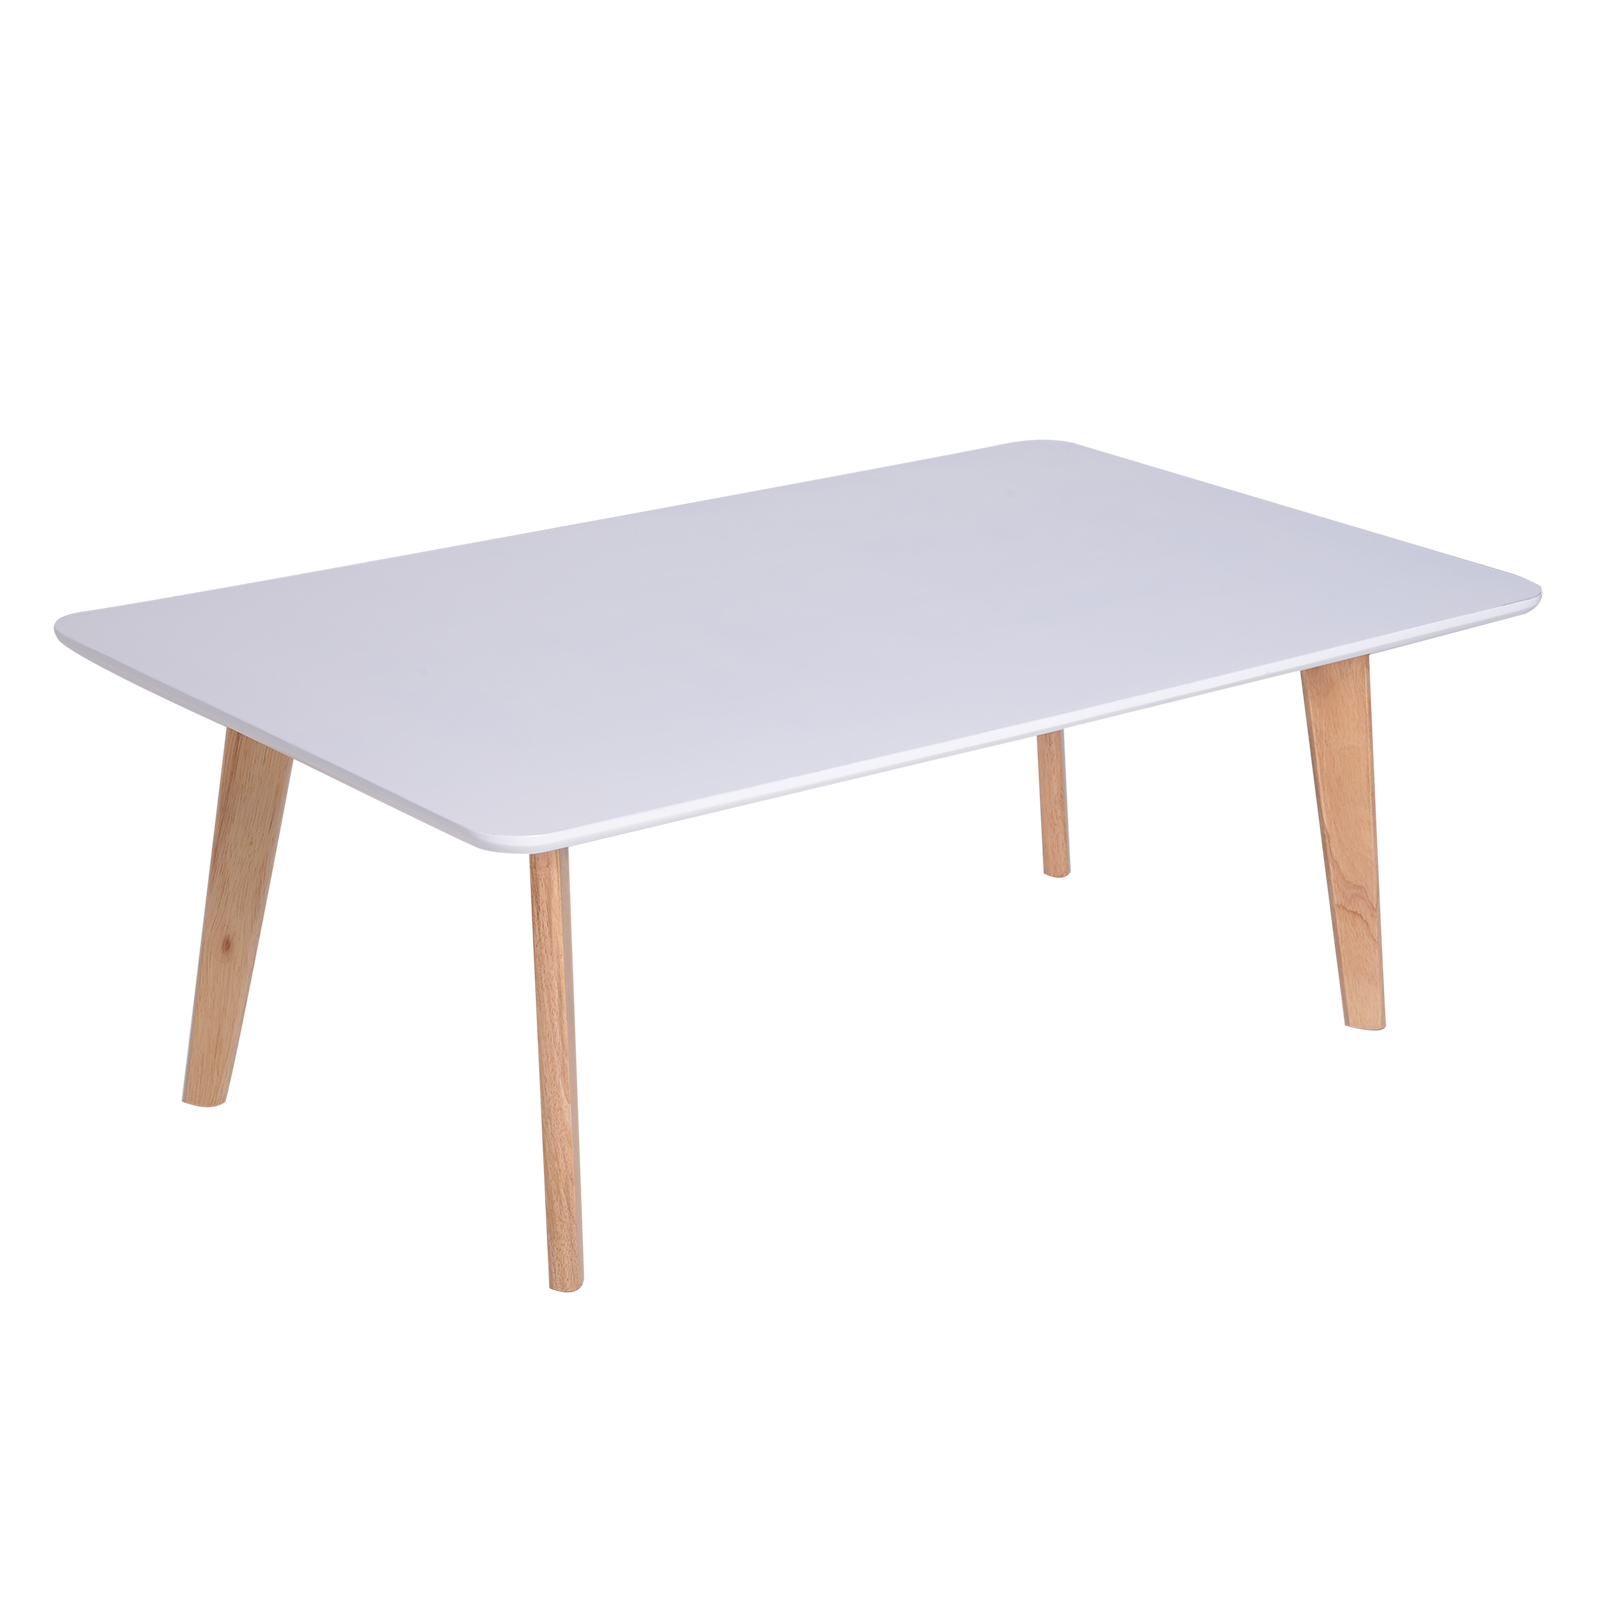 HOMCOM Coffee Table Nordic Style Living Room Wood 120x70x45 Cm White